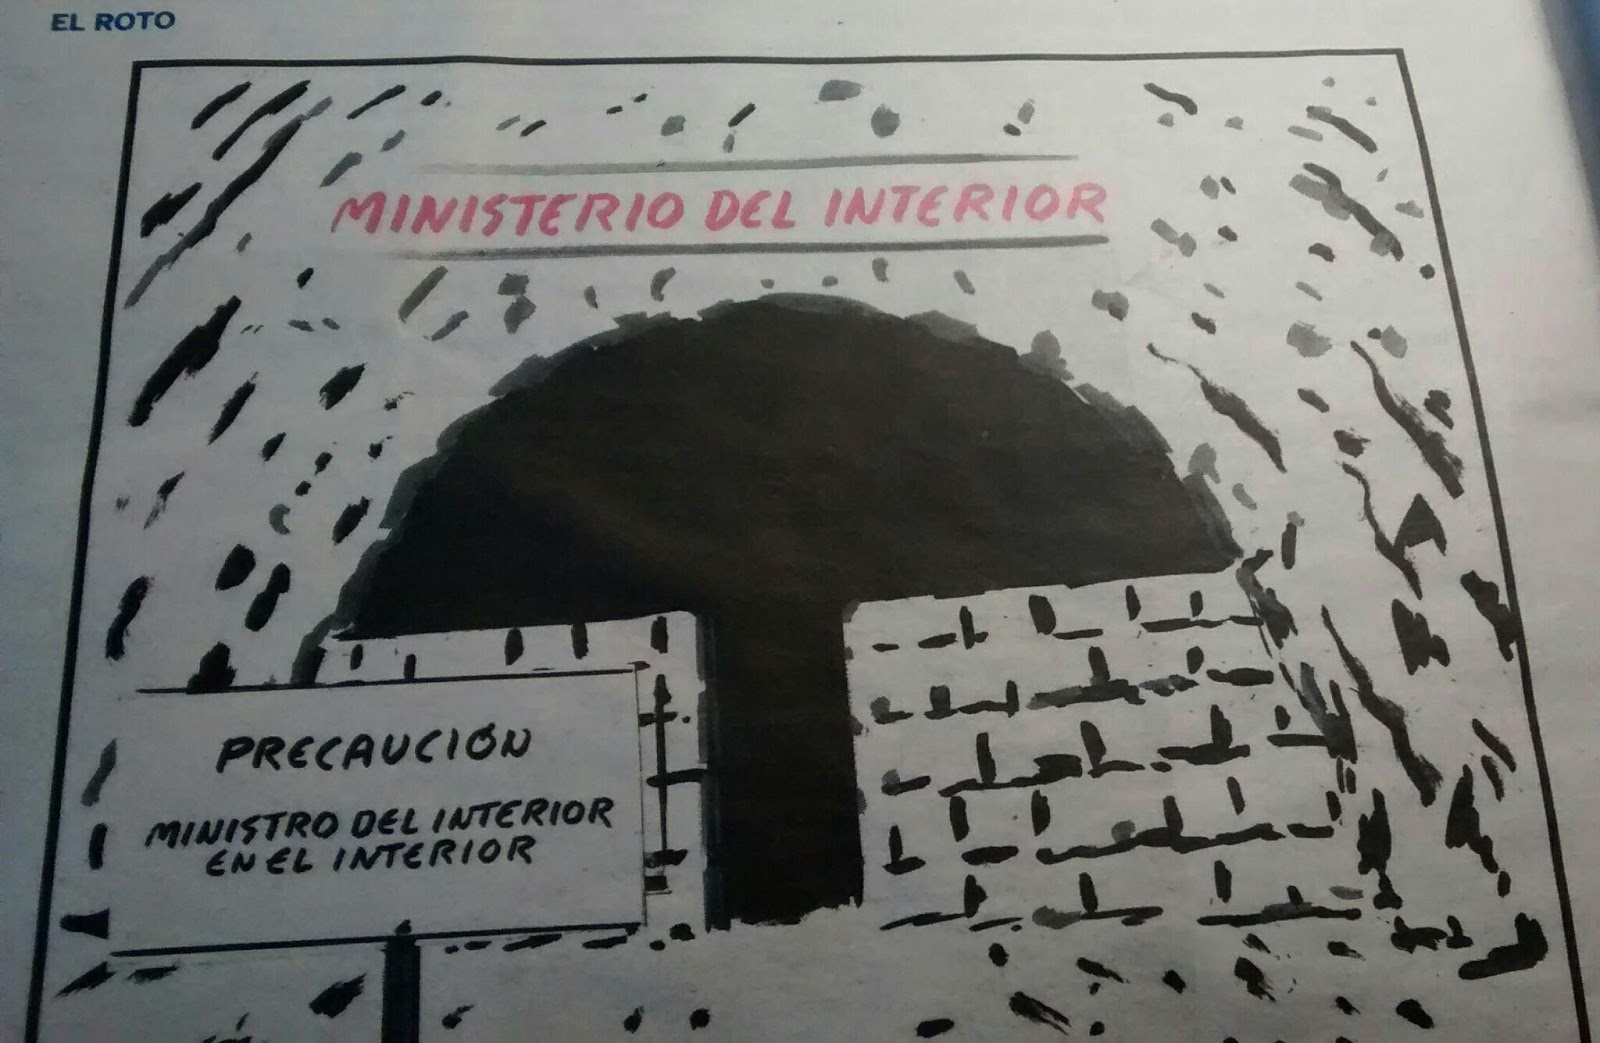 Todo es casi posible ministerio del interior de espa a for Notificacion ministerio del interior